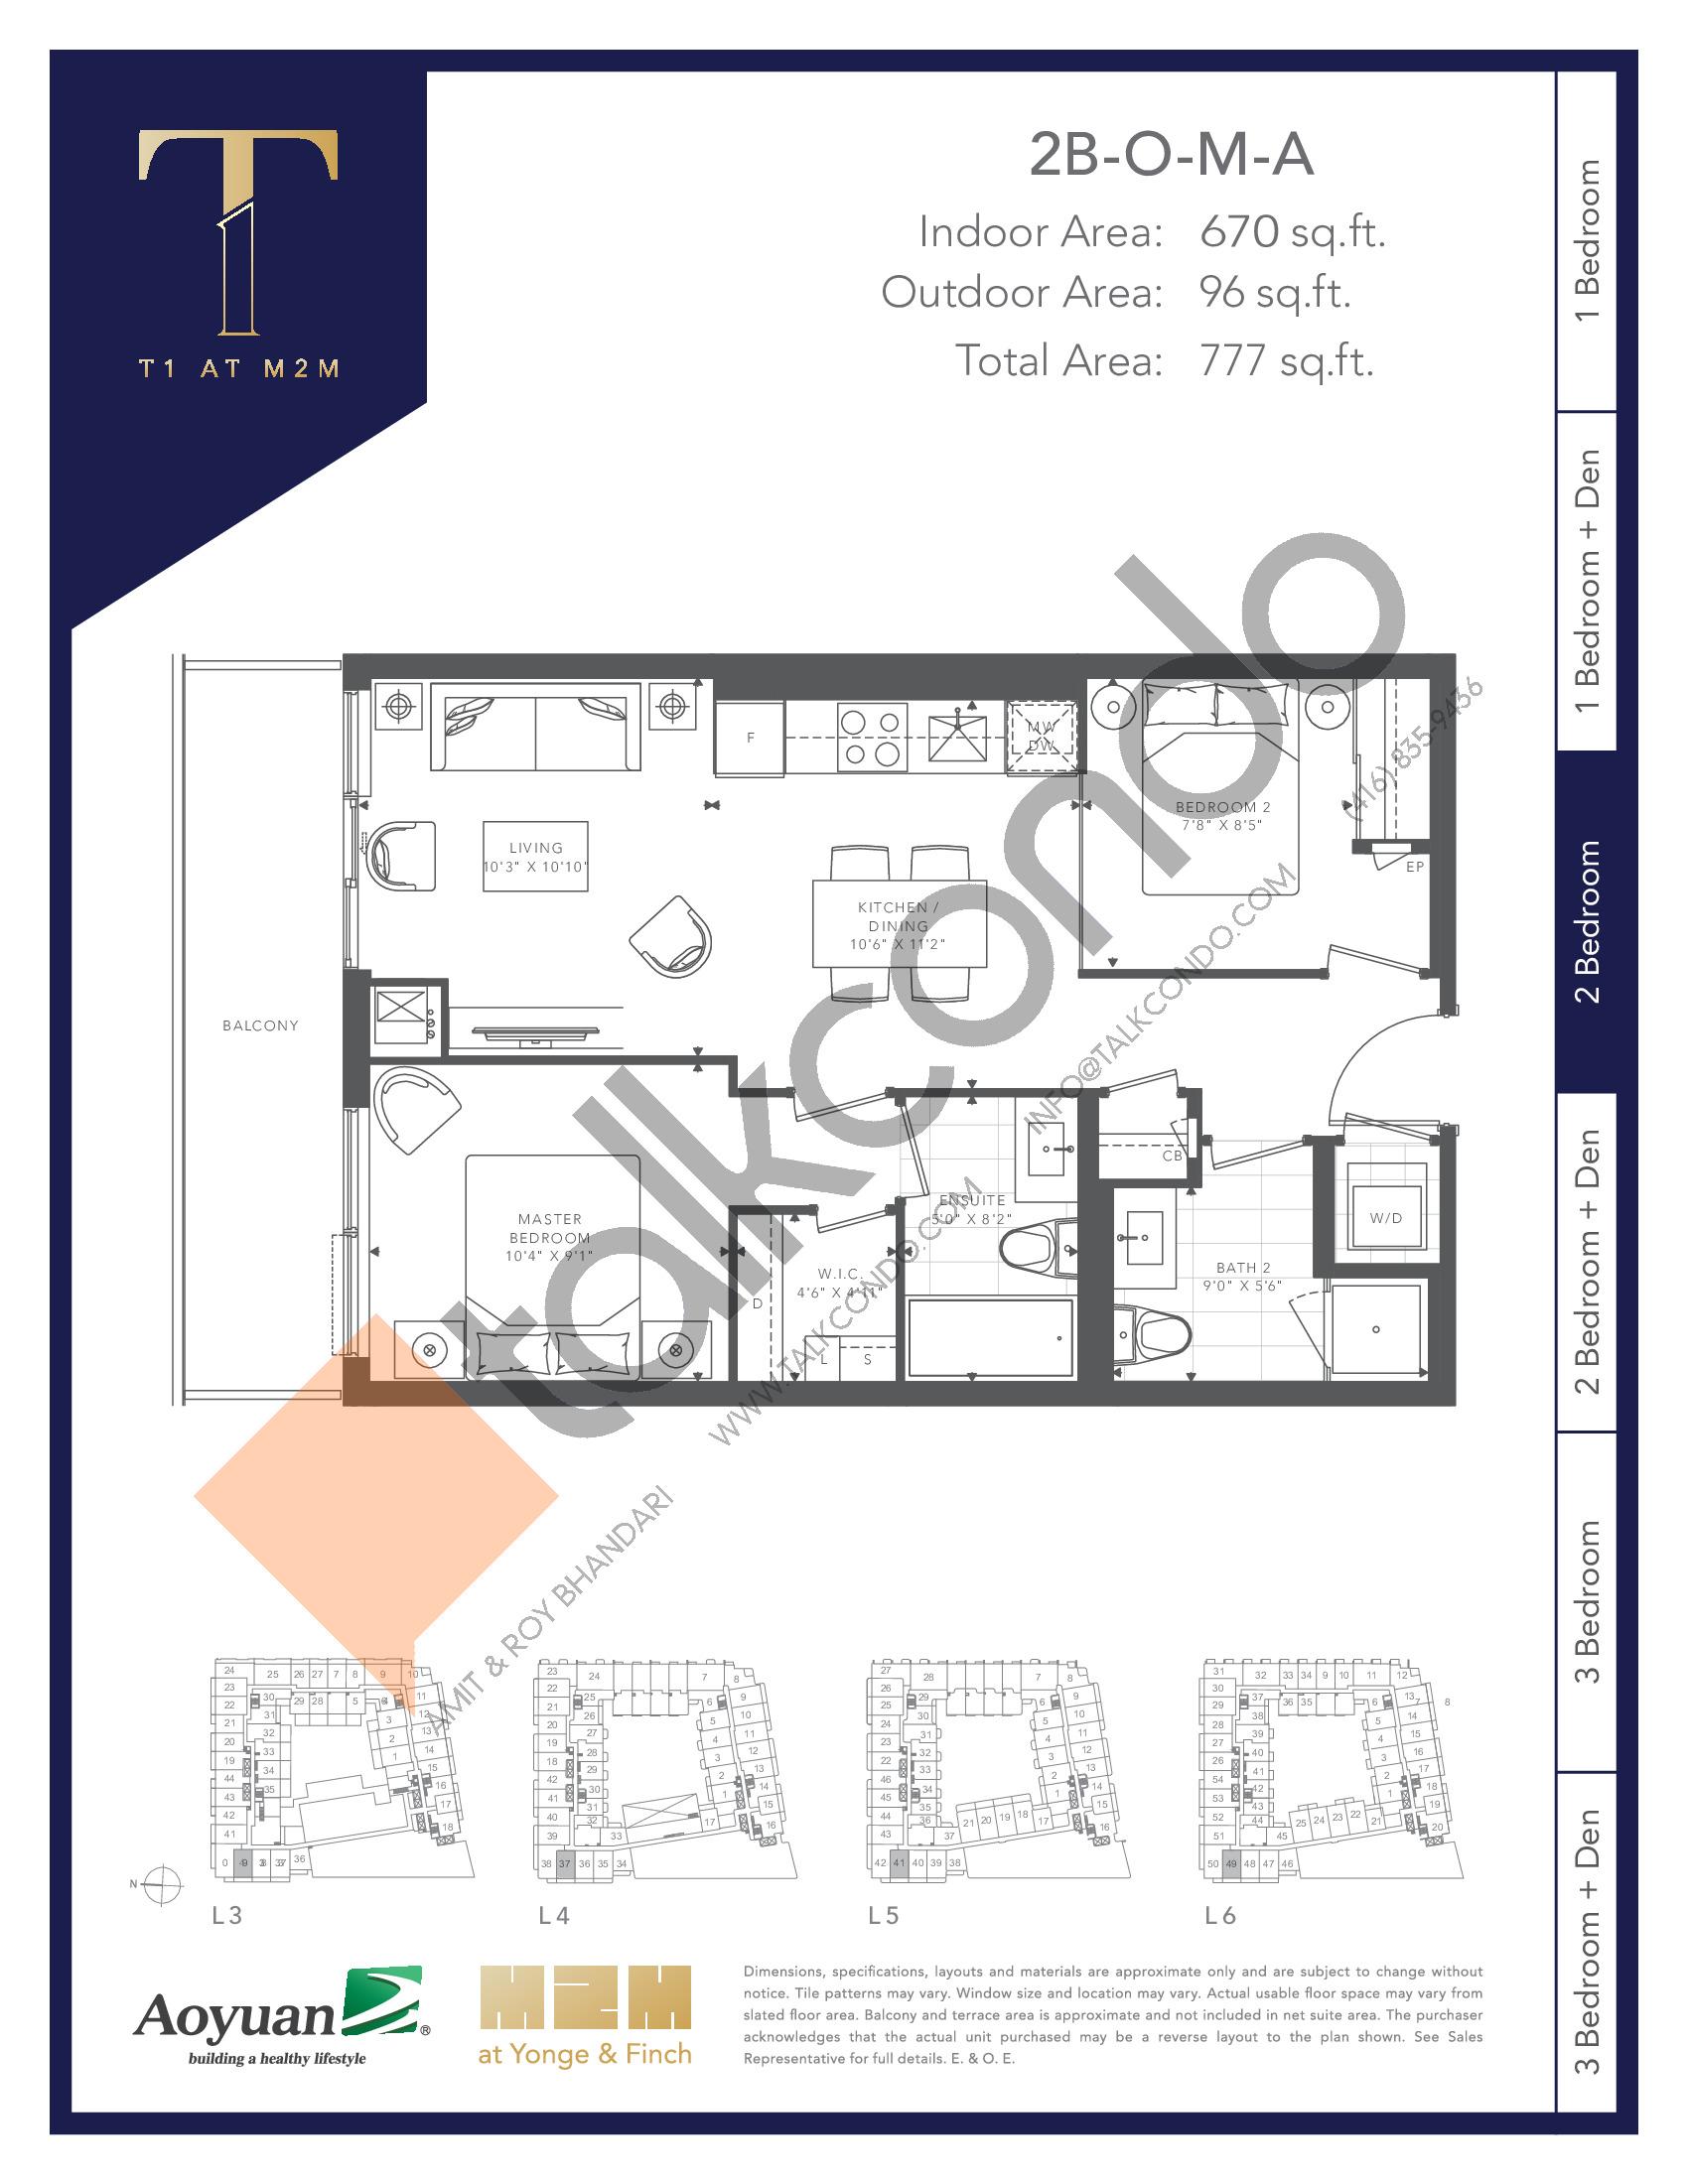 2B-O-M-A Floor Plan at T1 at M2M Condos - 670 sq.ft